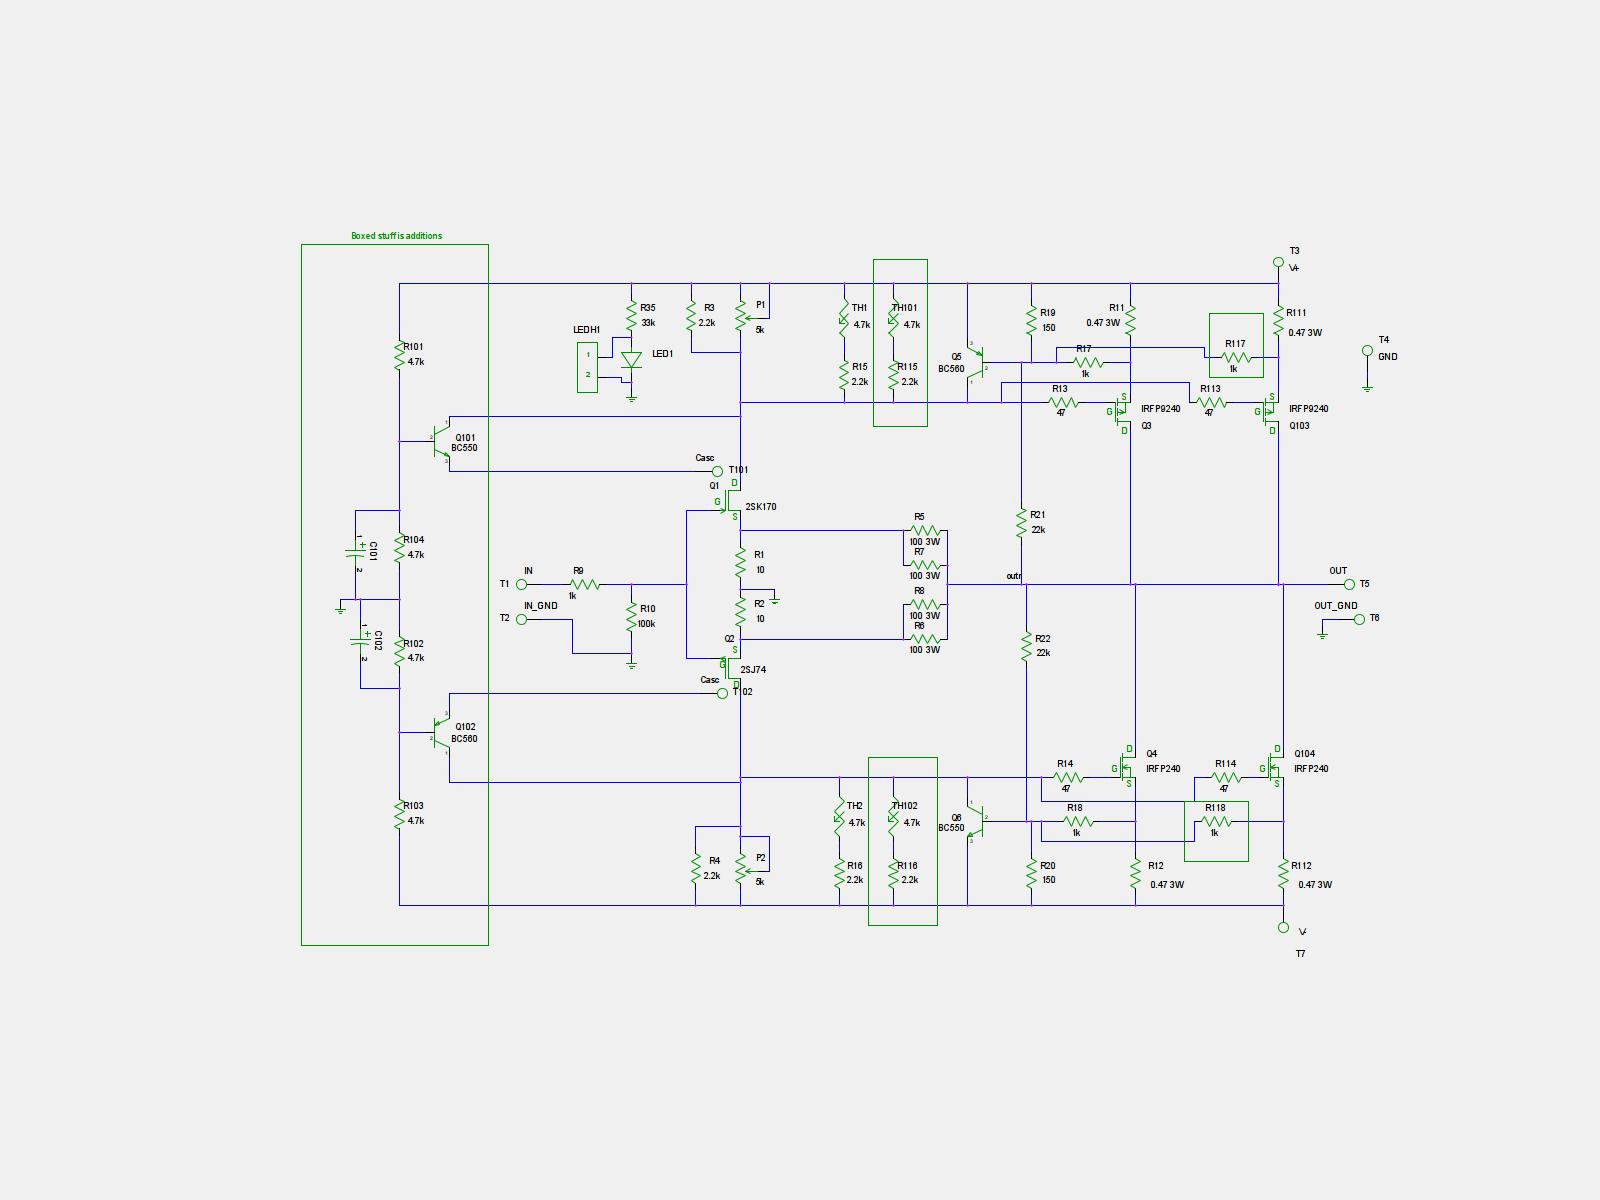 GB F5 Guide (pcb version 2) - diyAudio